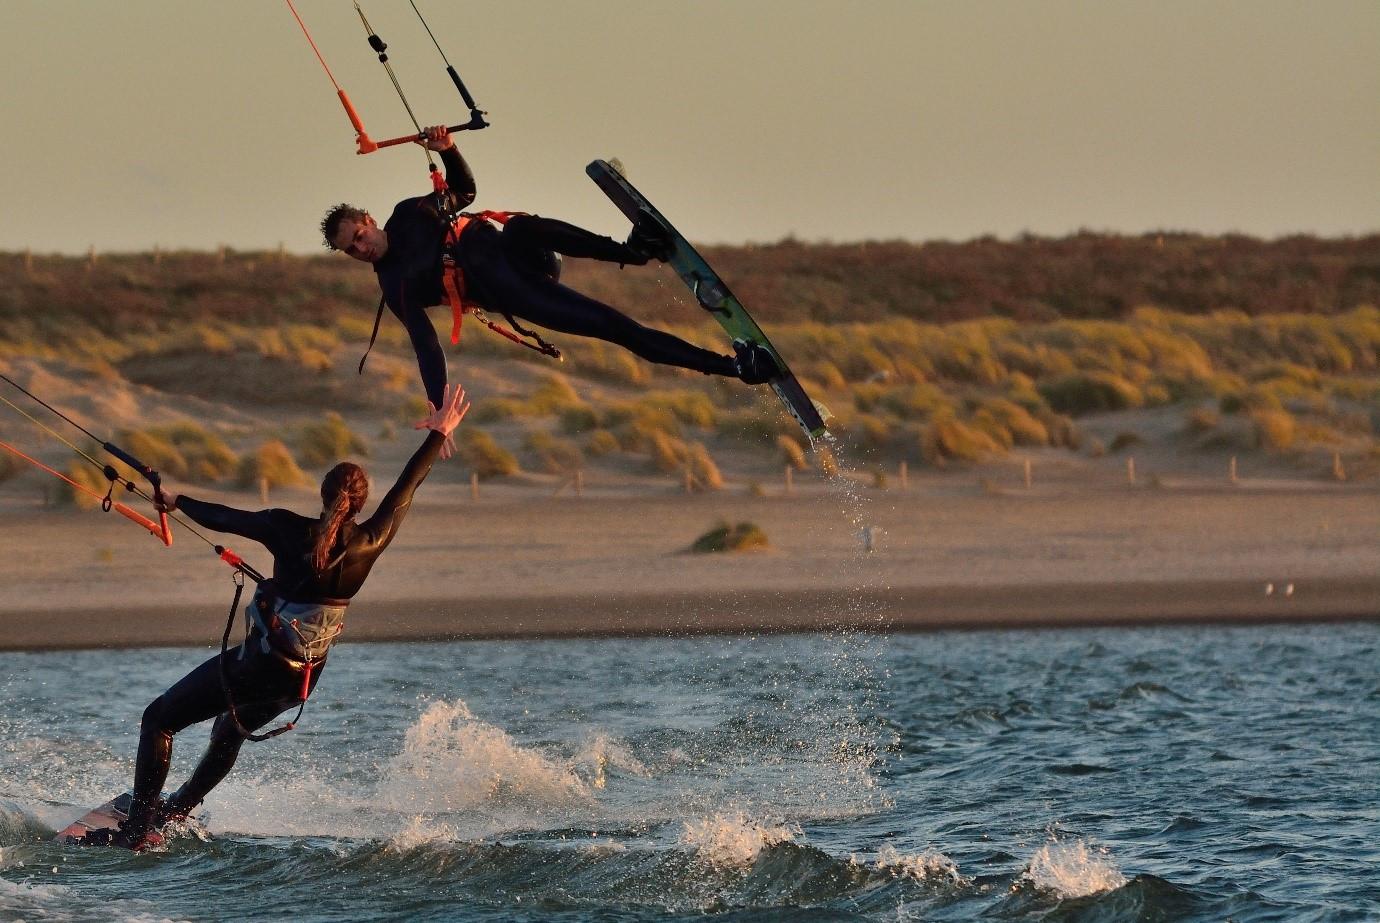 kitesurf-fotograaf-patrick-van-der-ven-zandmotor-kijkduin